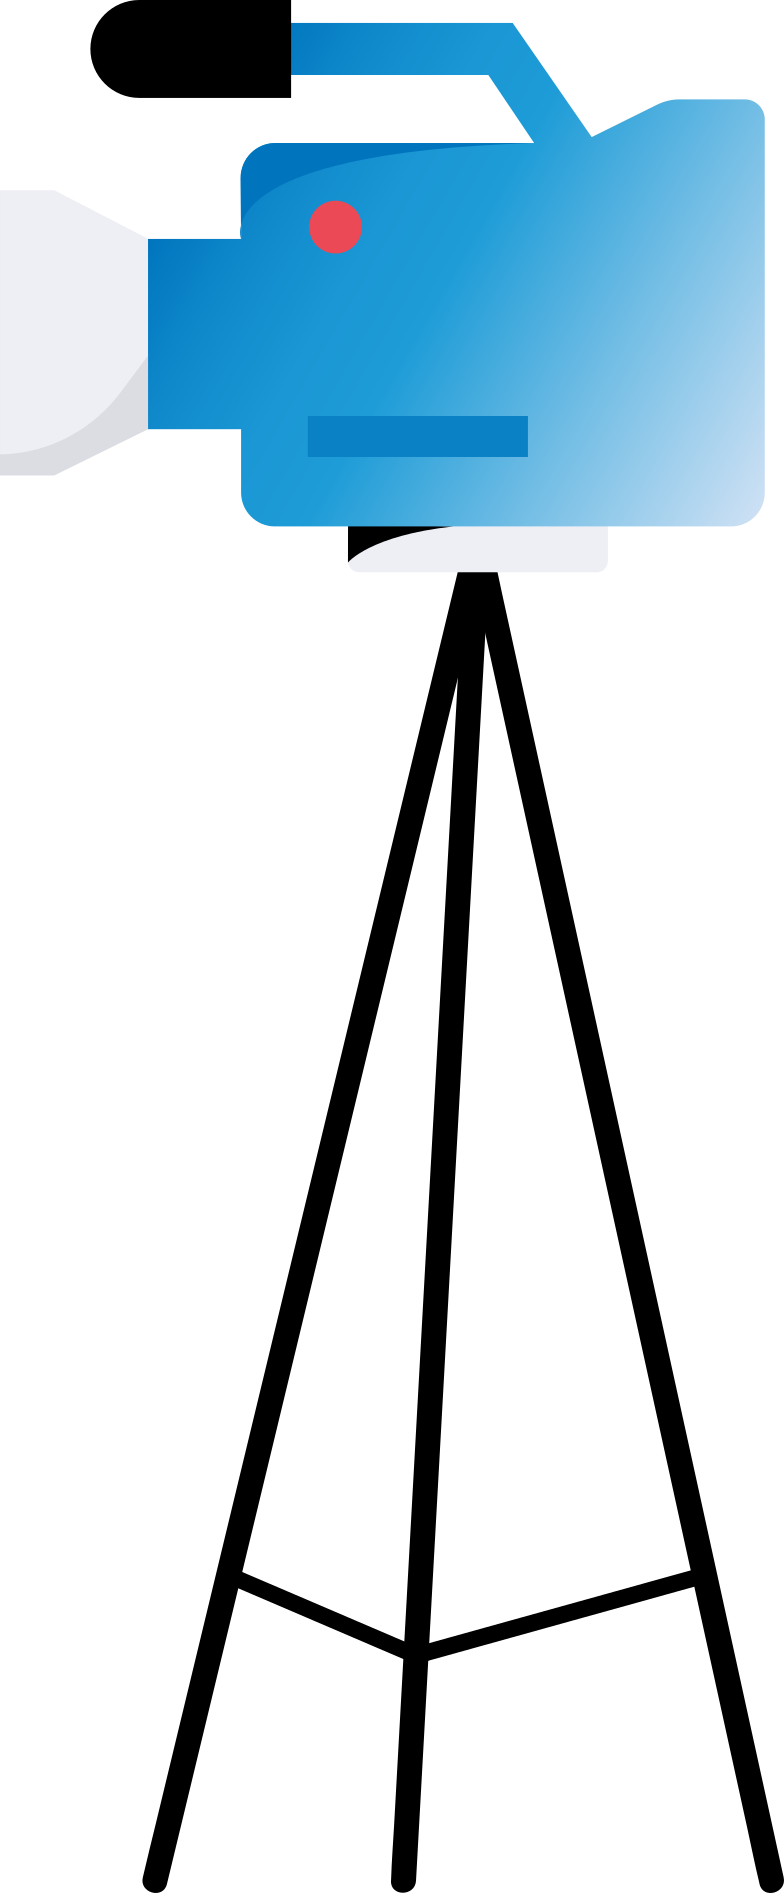 video camera Clipart illustration in PNG, SVG